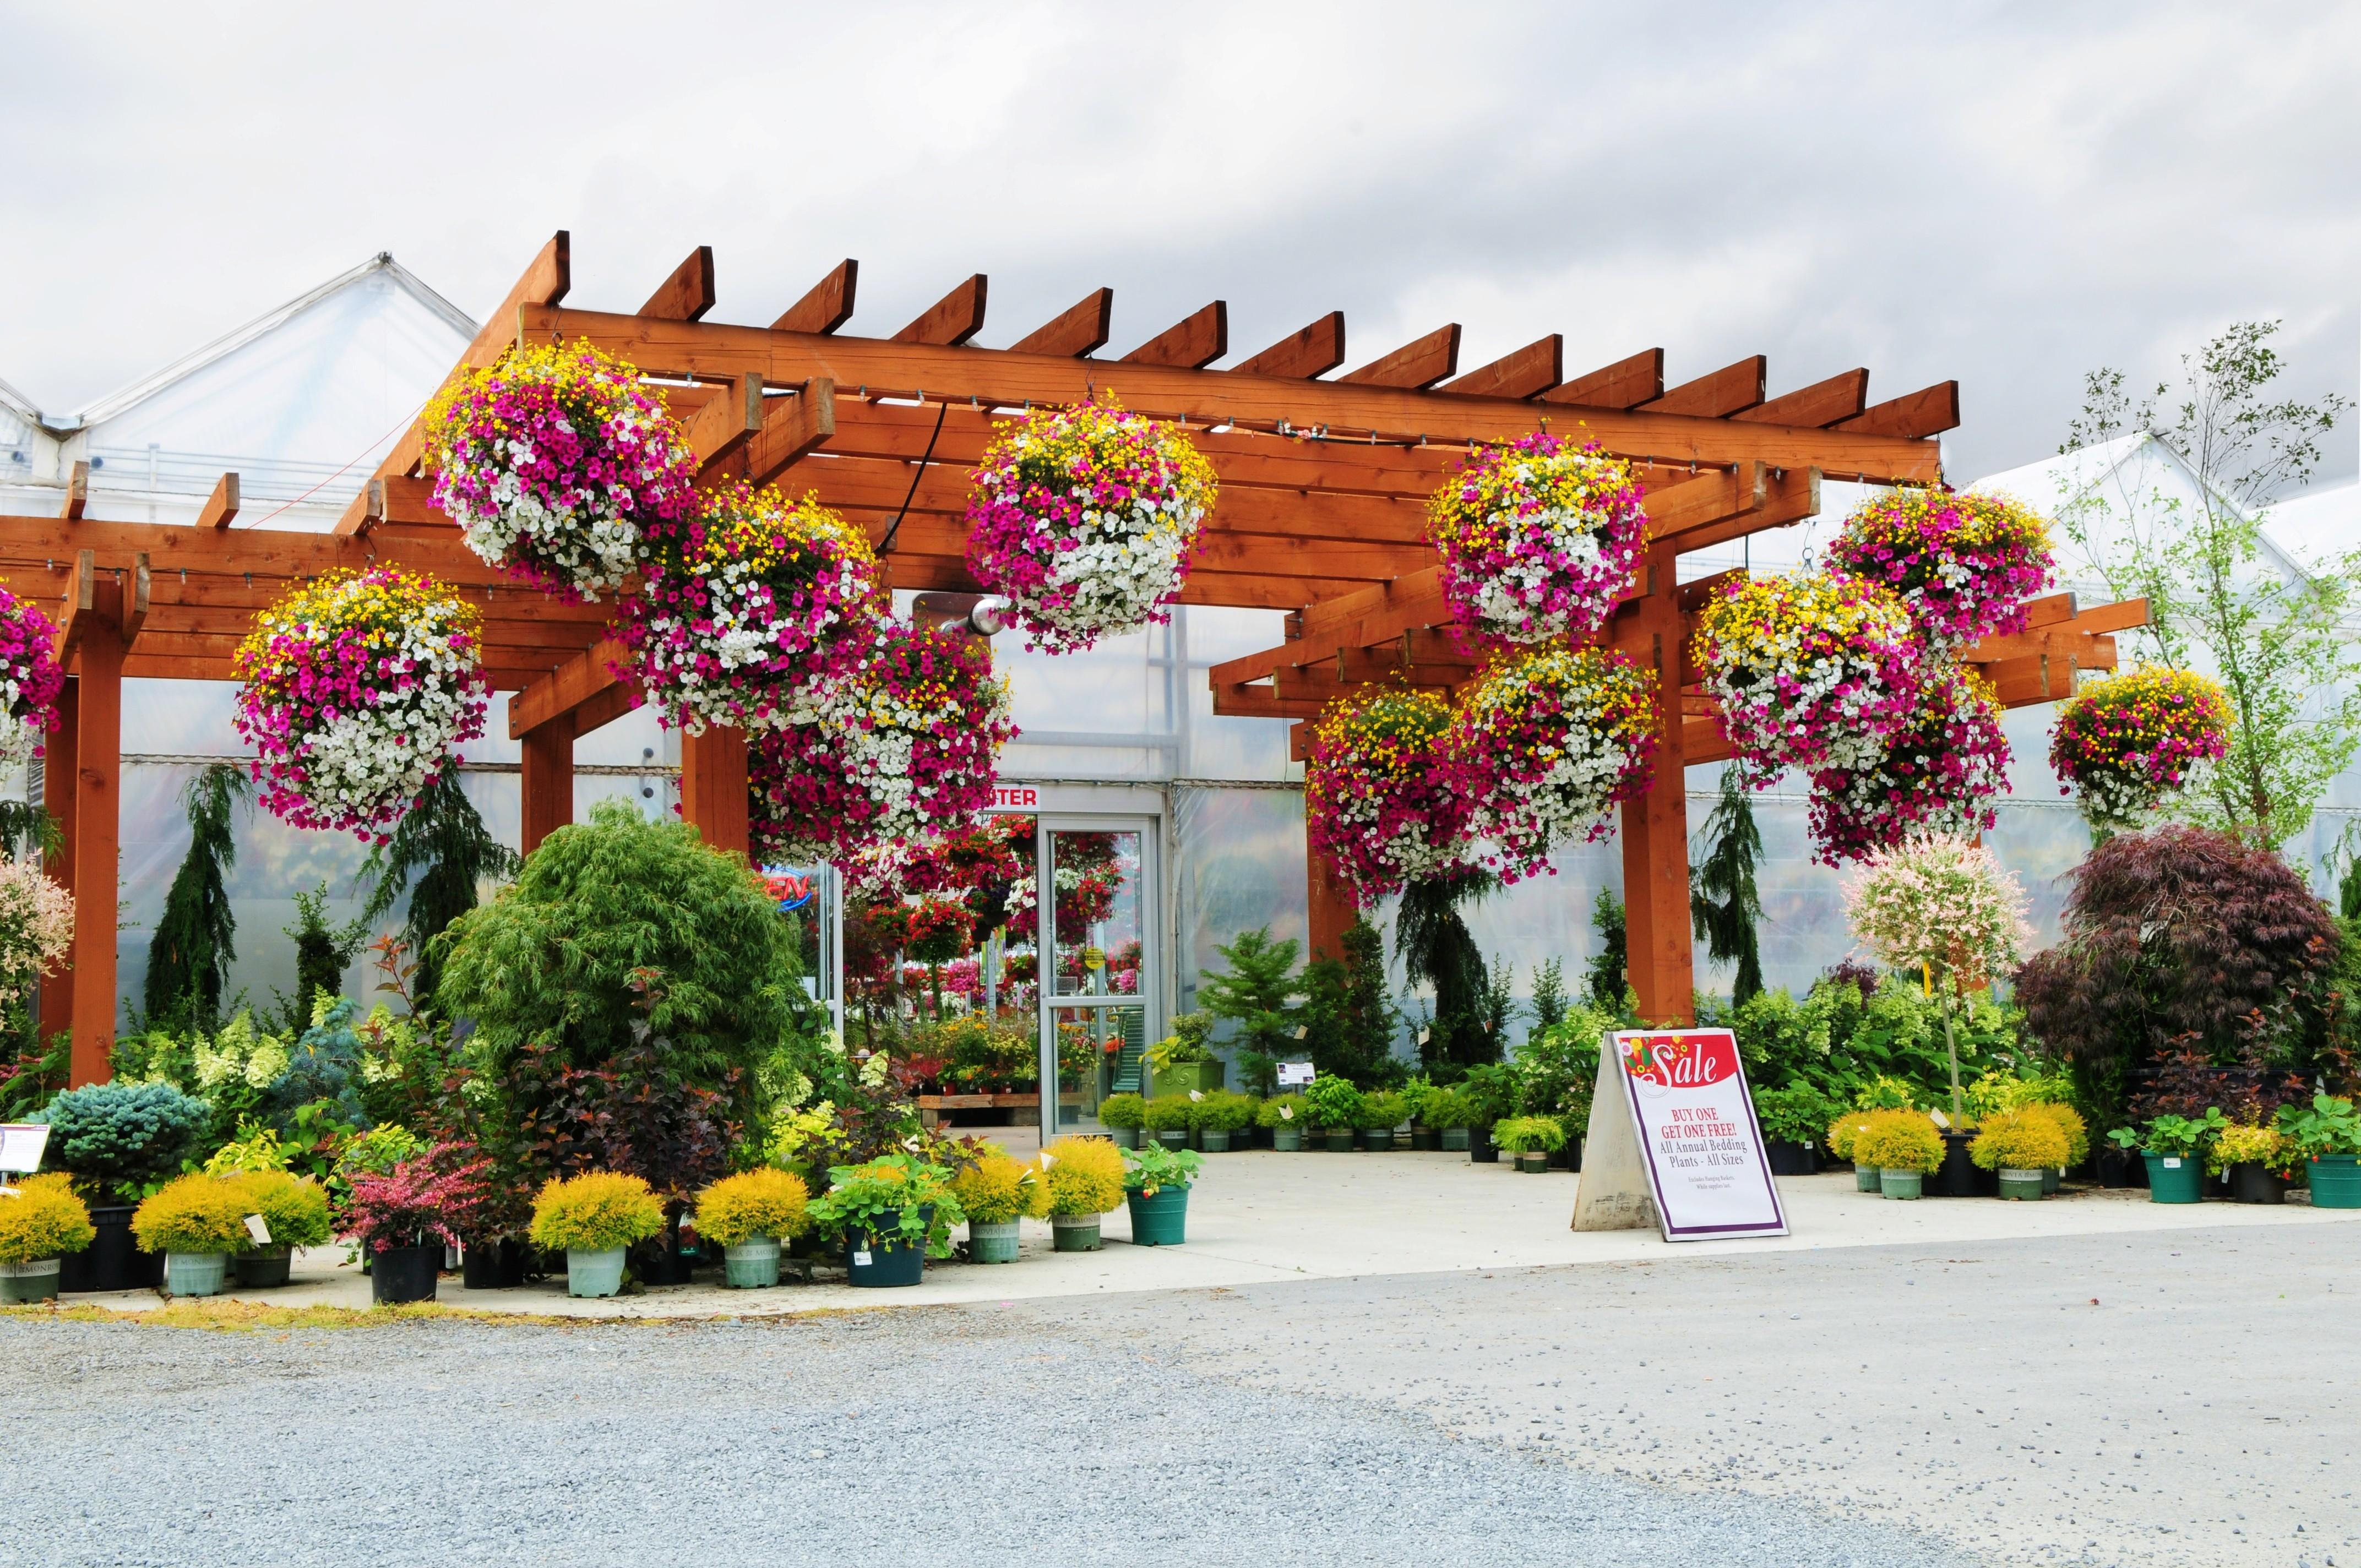 About | The Plant Farm